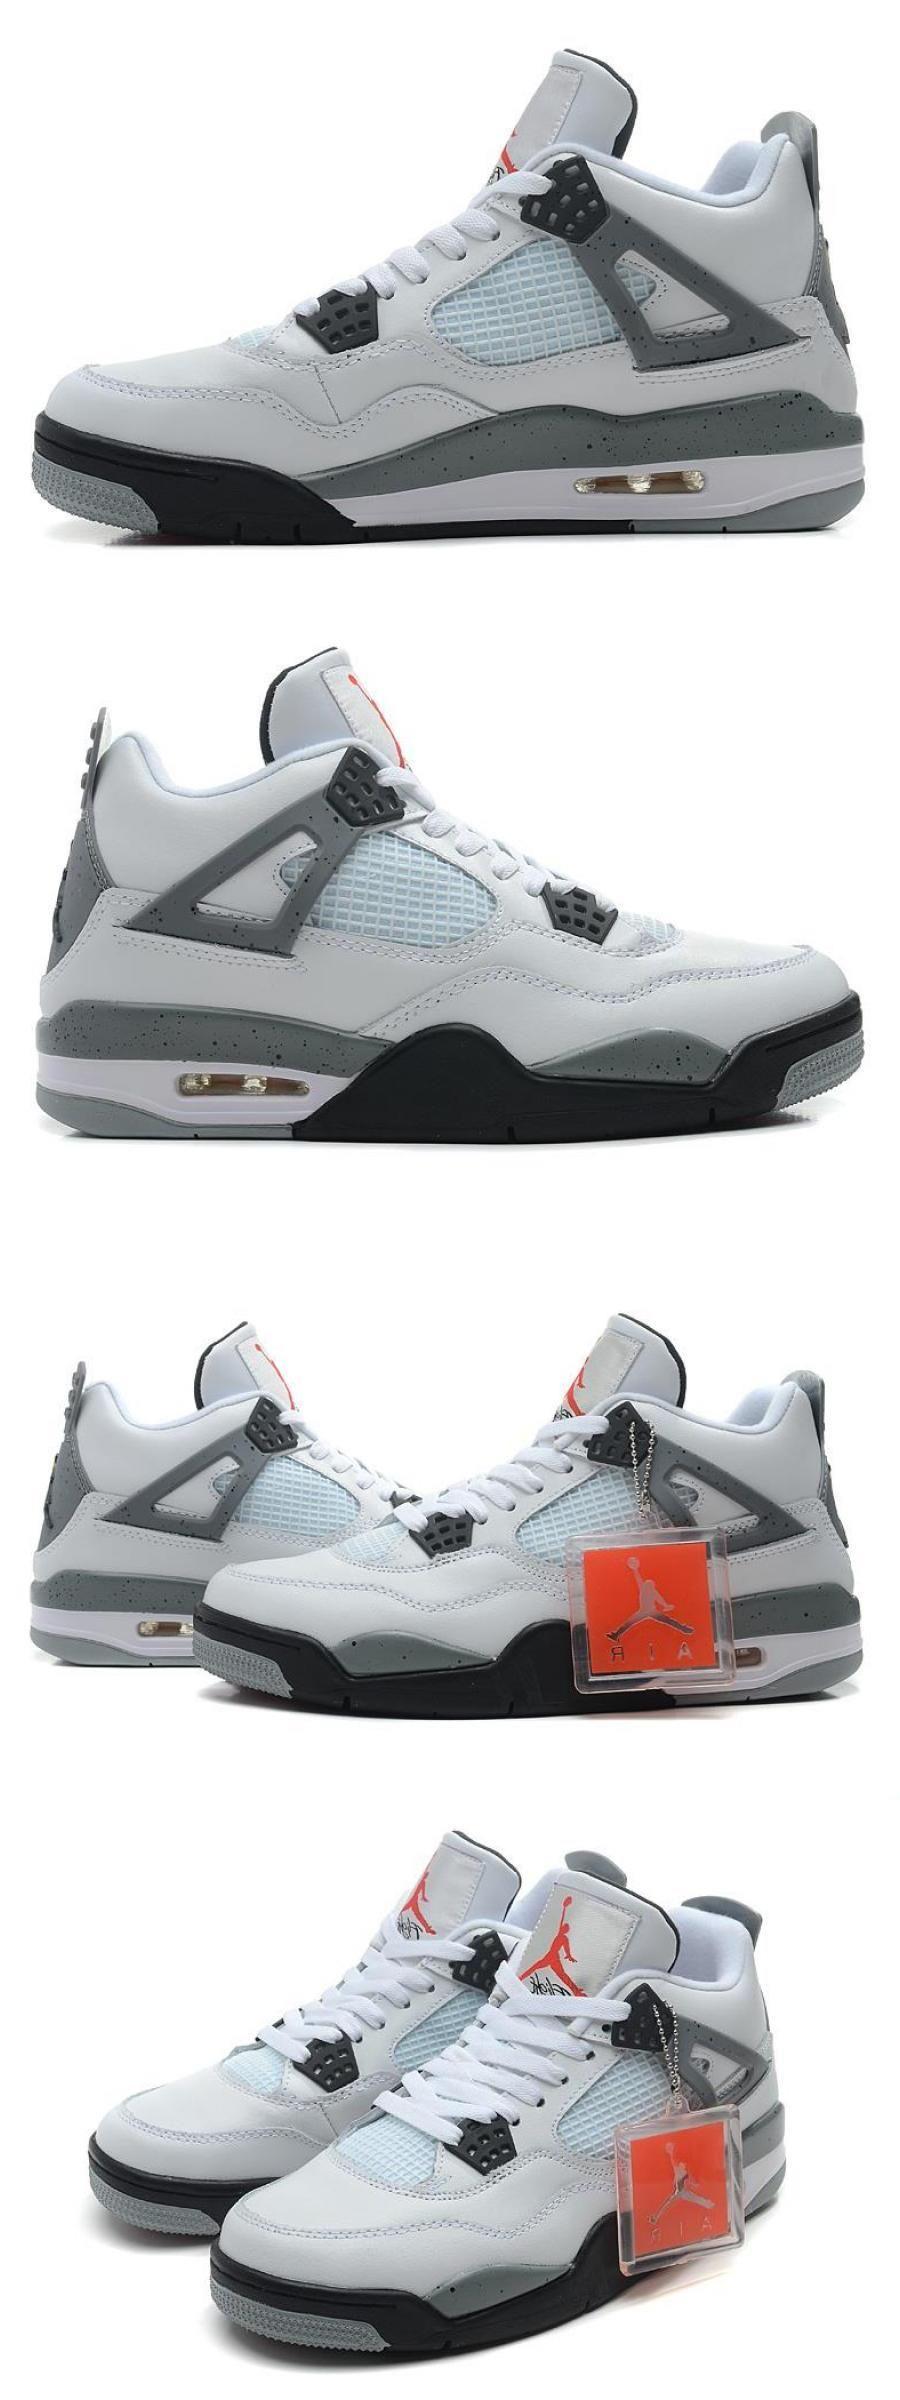 2020 的 Air Jordan 4 White/blackcement Grey 主题